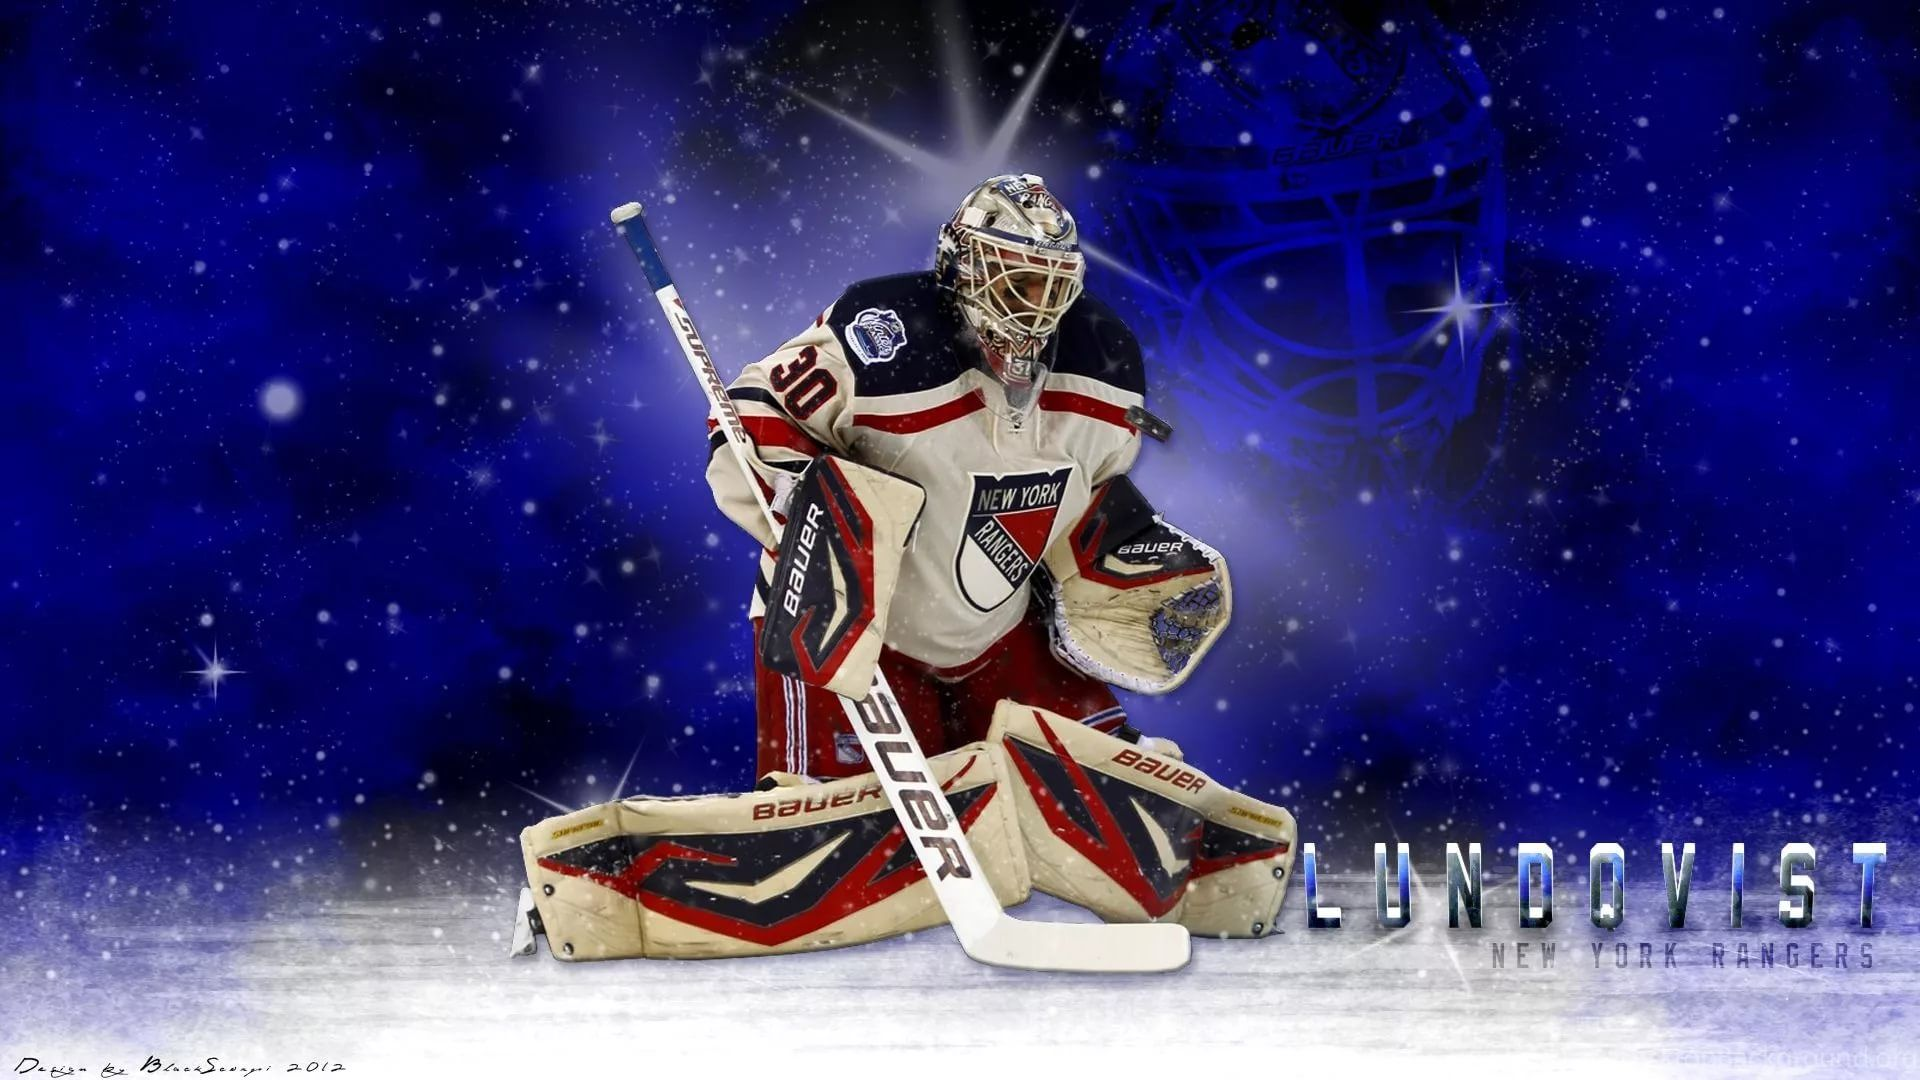 Ice Hockey hd wallpaper for laptop